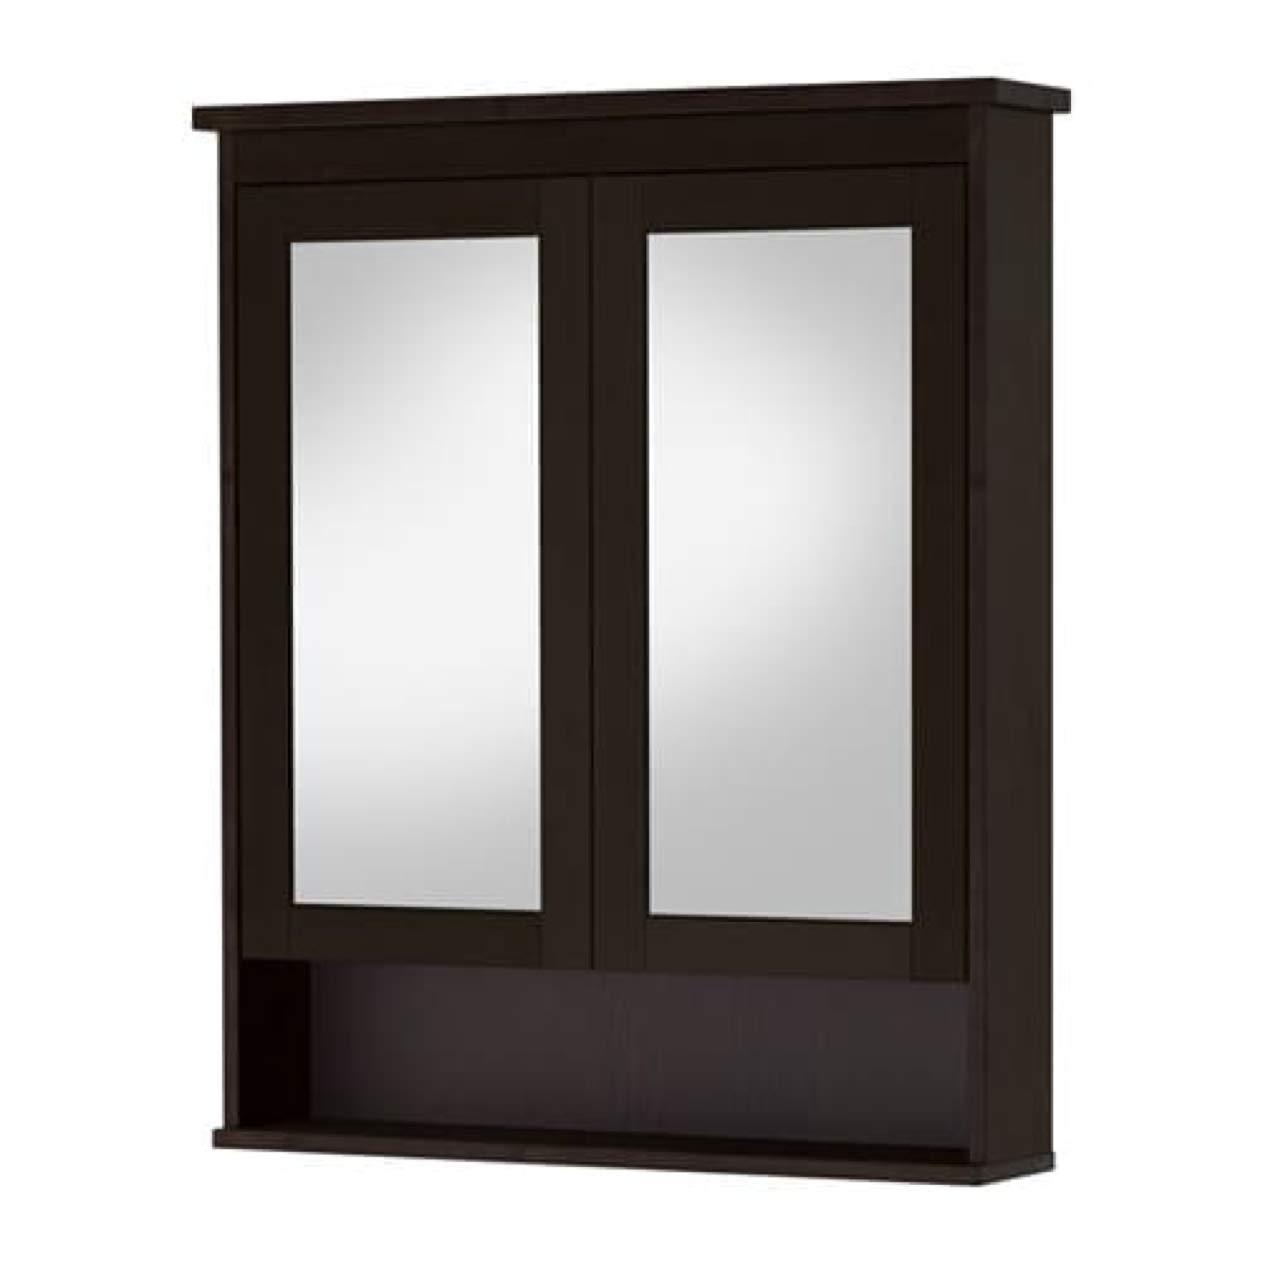 Ordinaire Amazon.com: IKEA Hemnes Mirror Cabinet With 2 Doors Black Brown Stain  602.176.76 Size: 32 5/8x6 1/4x38 5/8: Home U0026 Kitchen